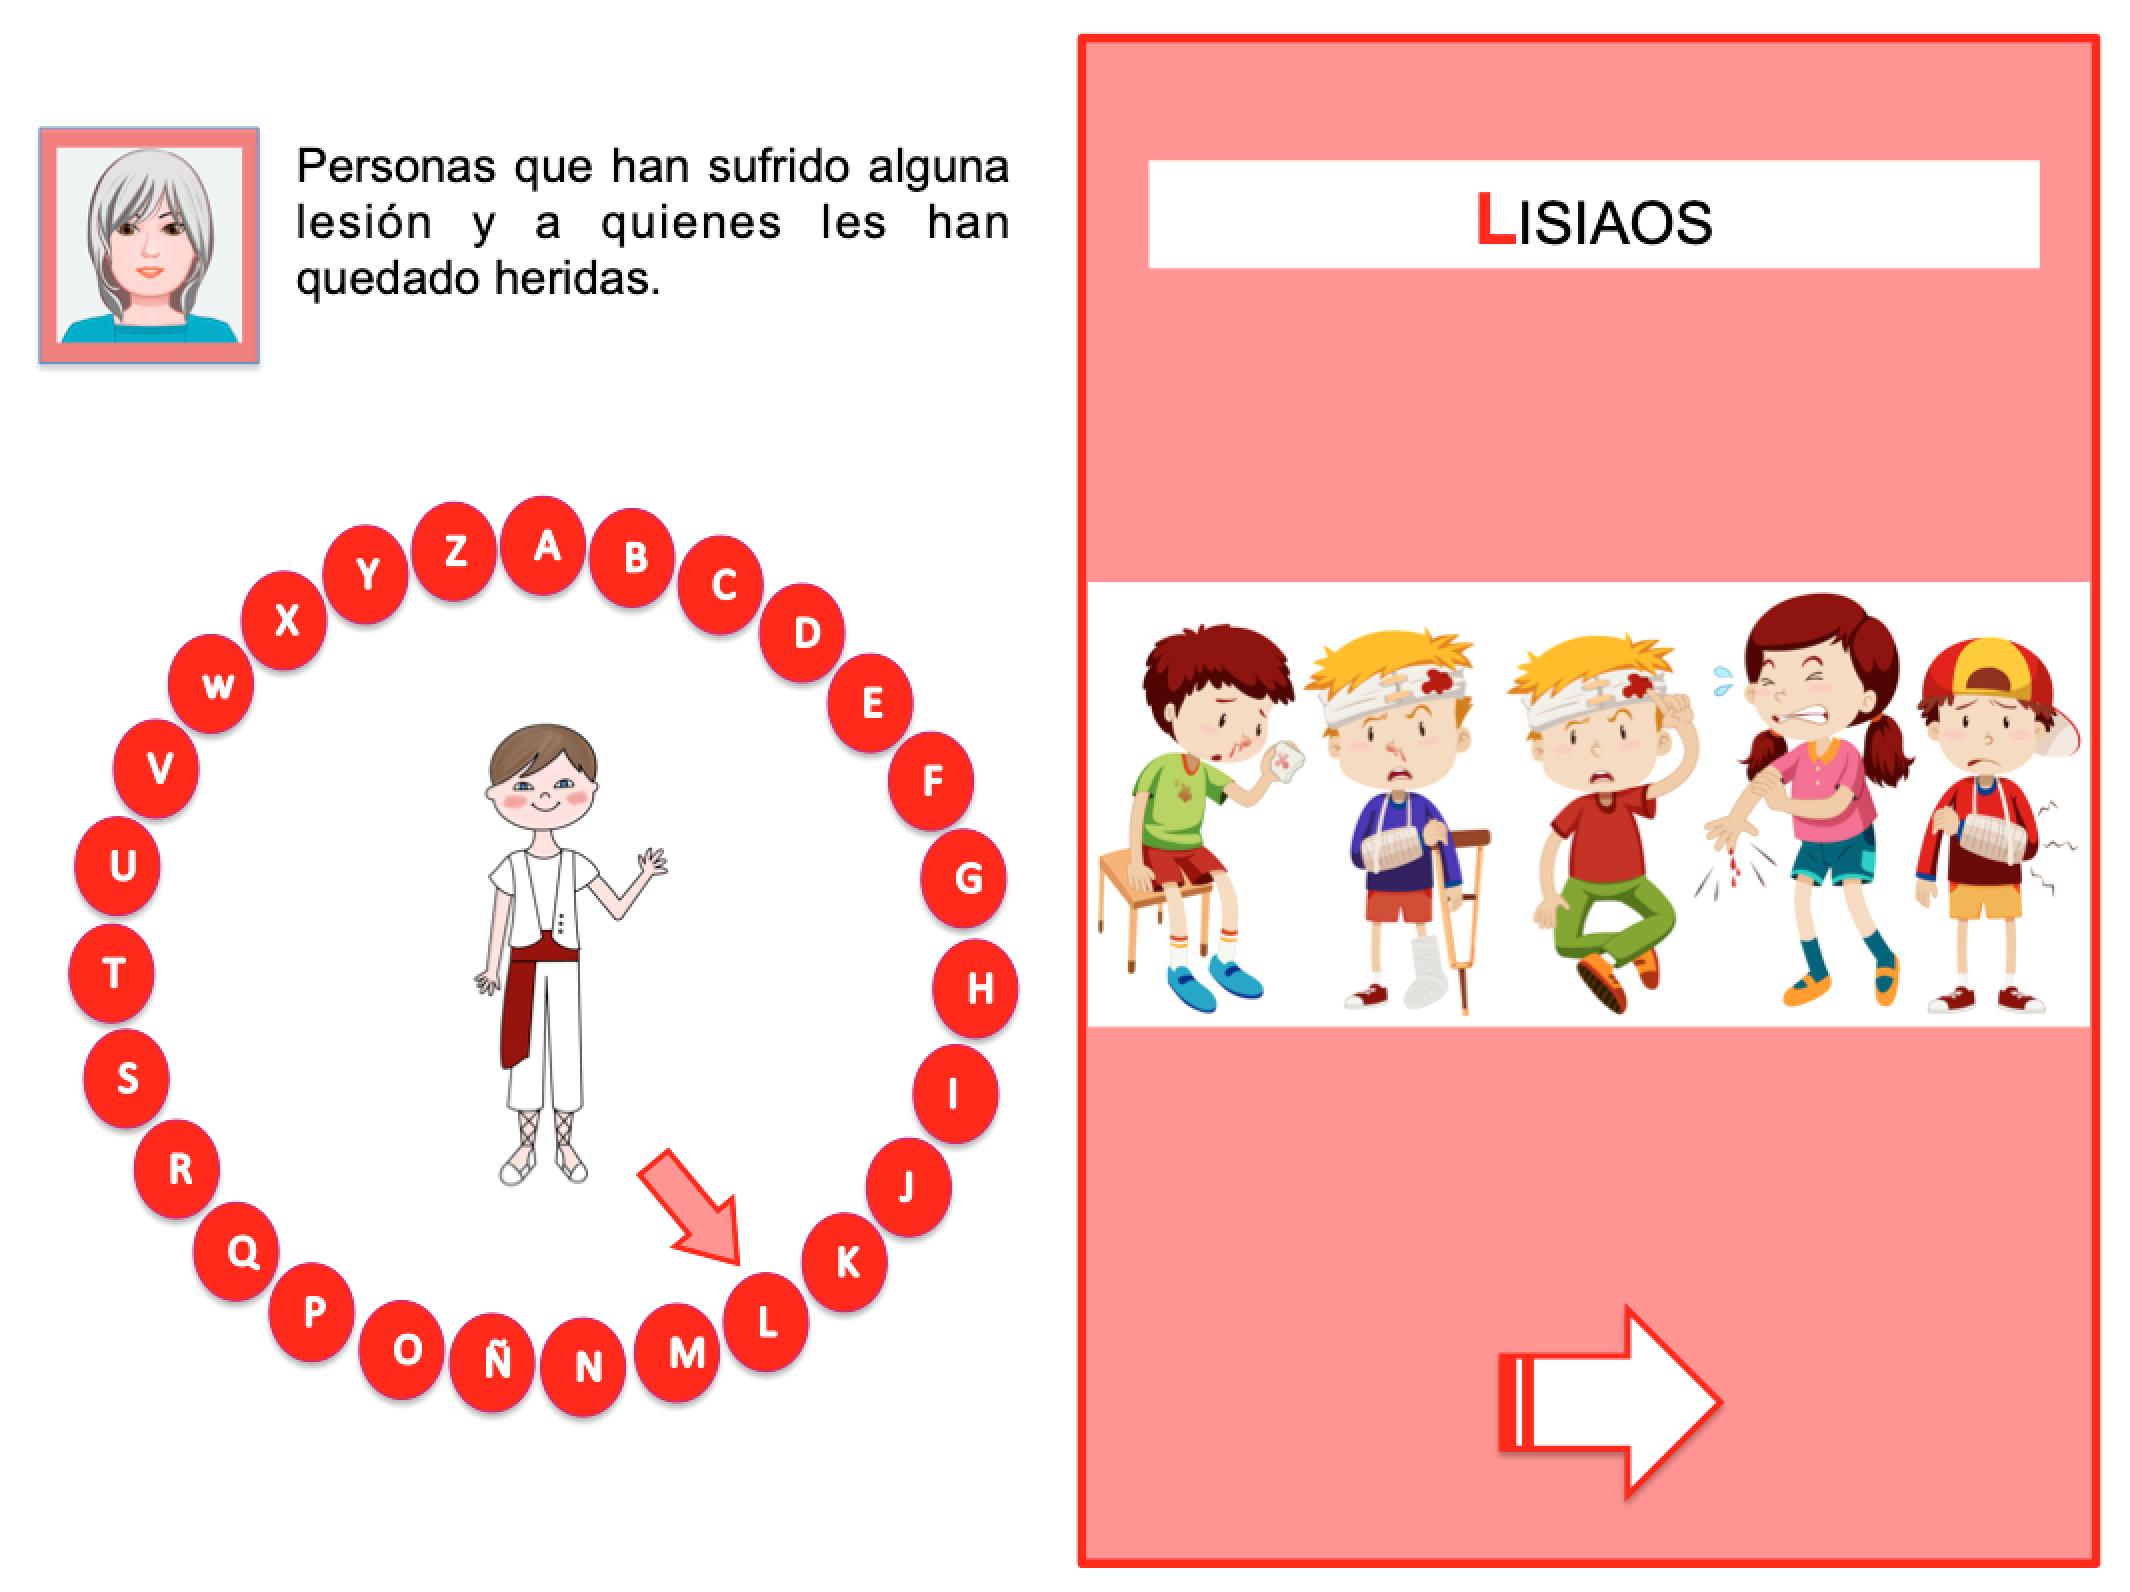 3B_lisiaos